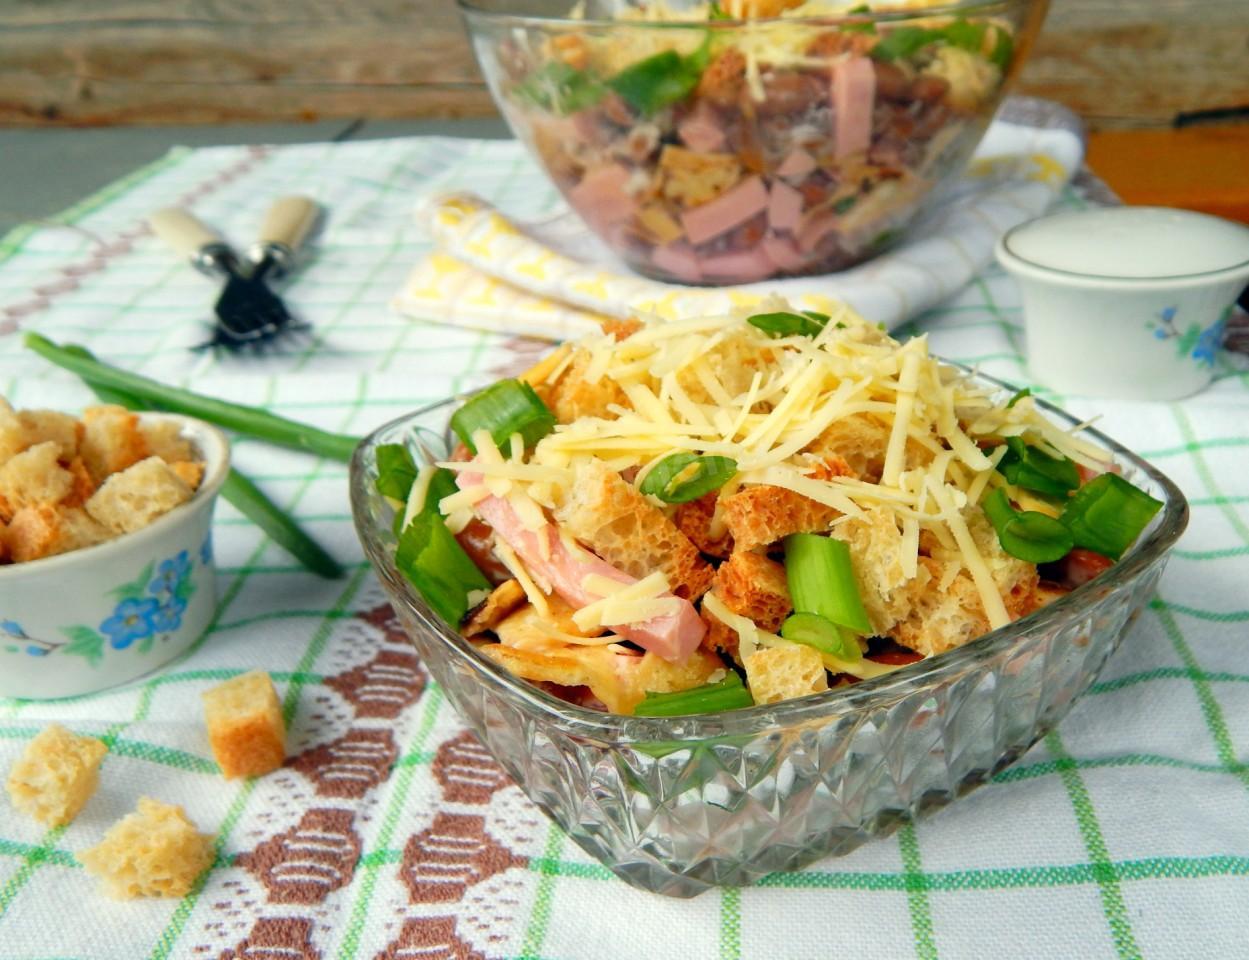 доставили салат жигули рецепт с фото под